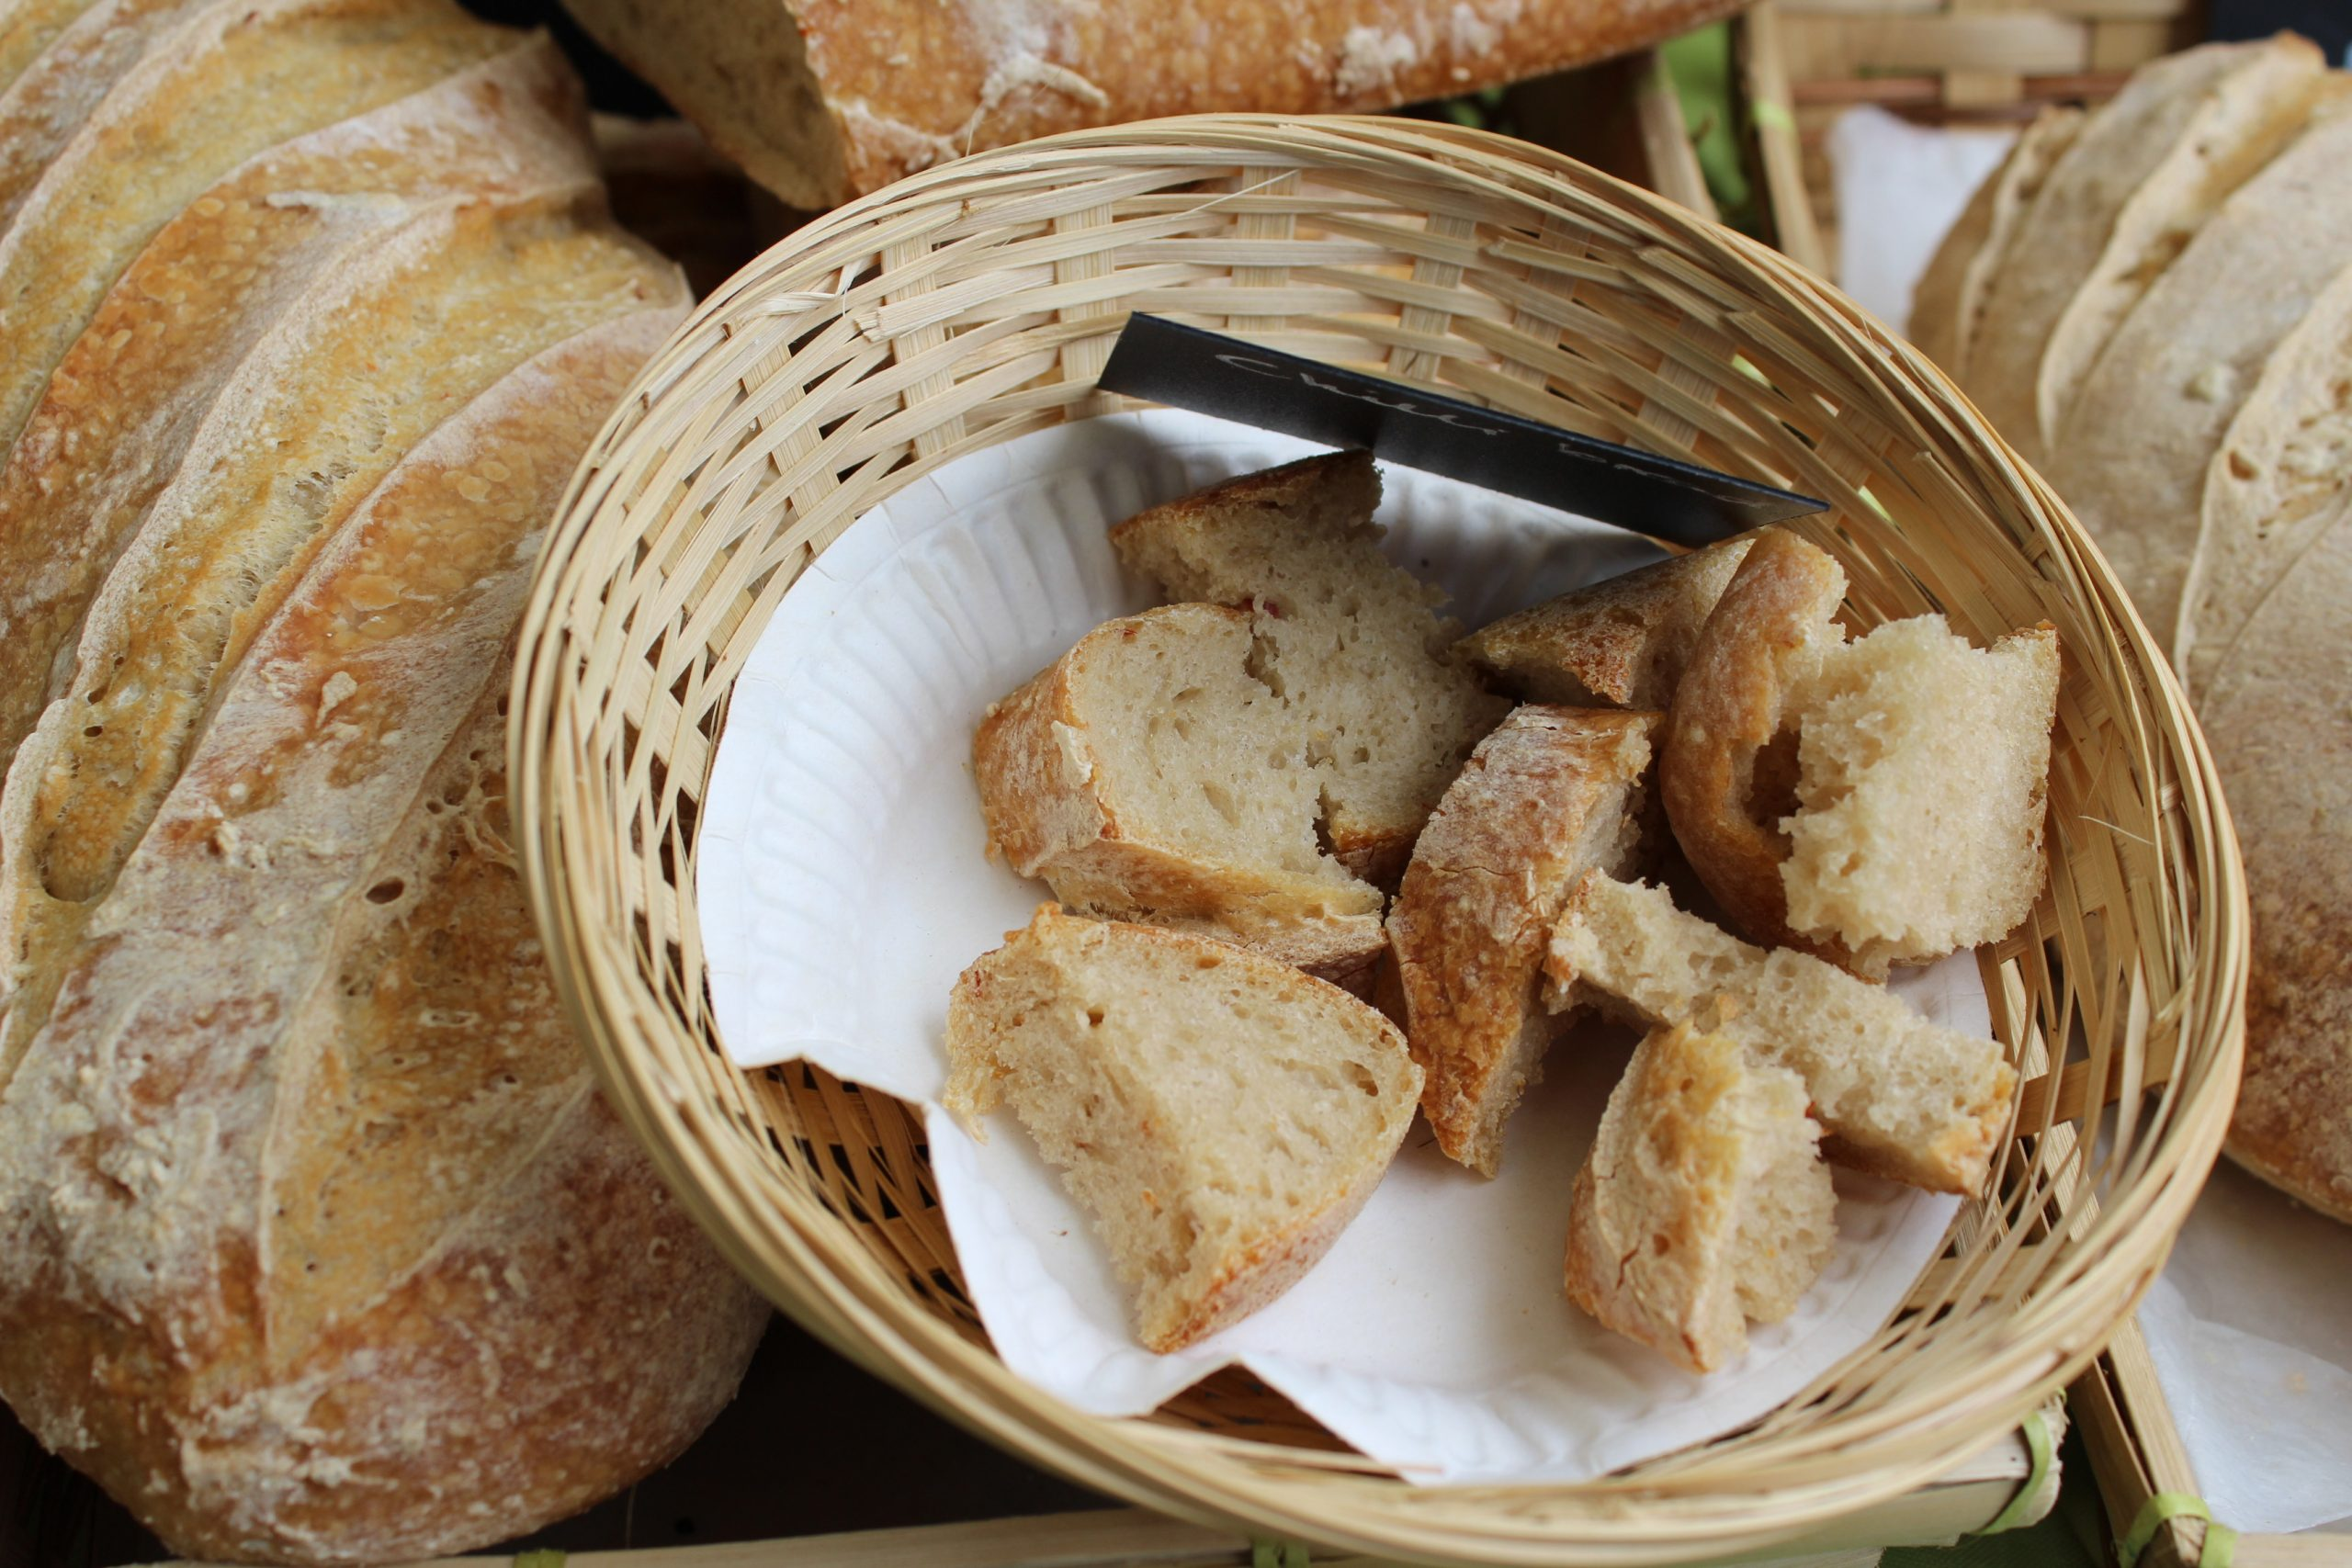 Bread seller Loughton Market